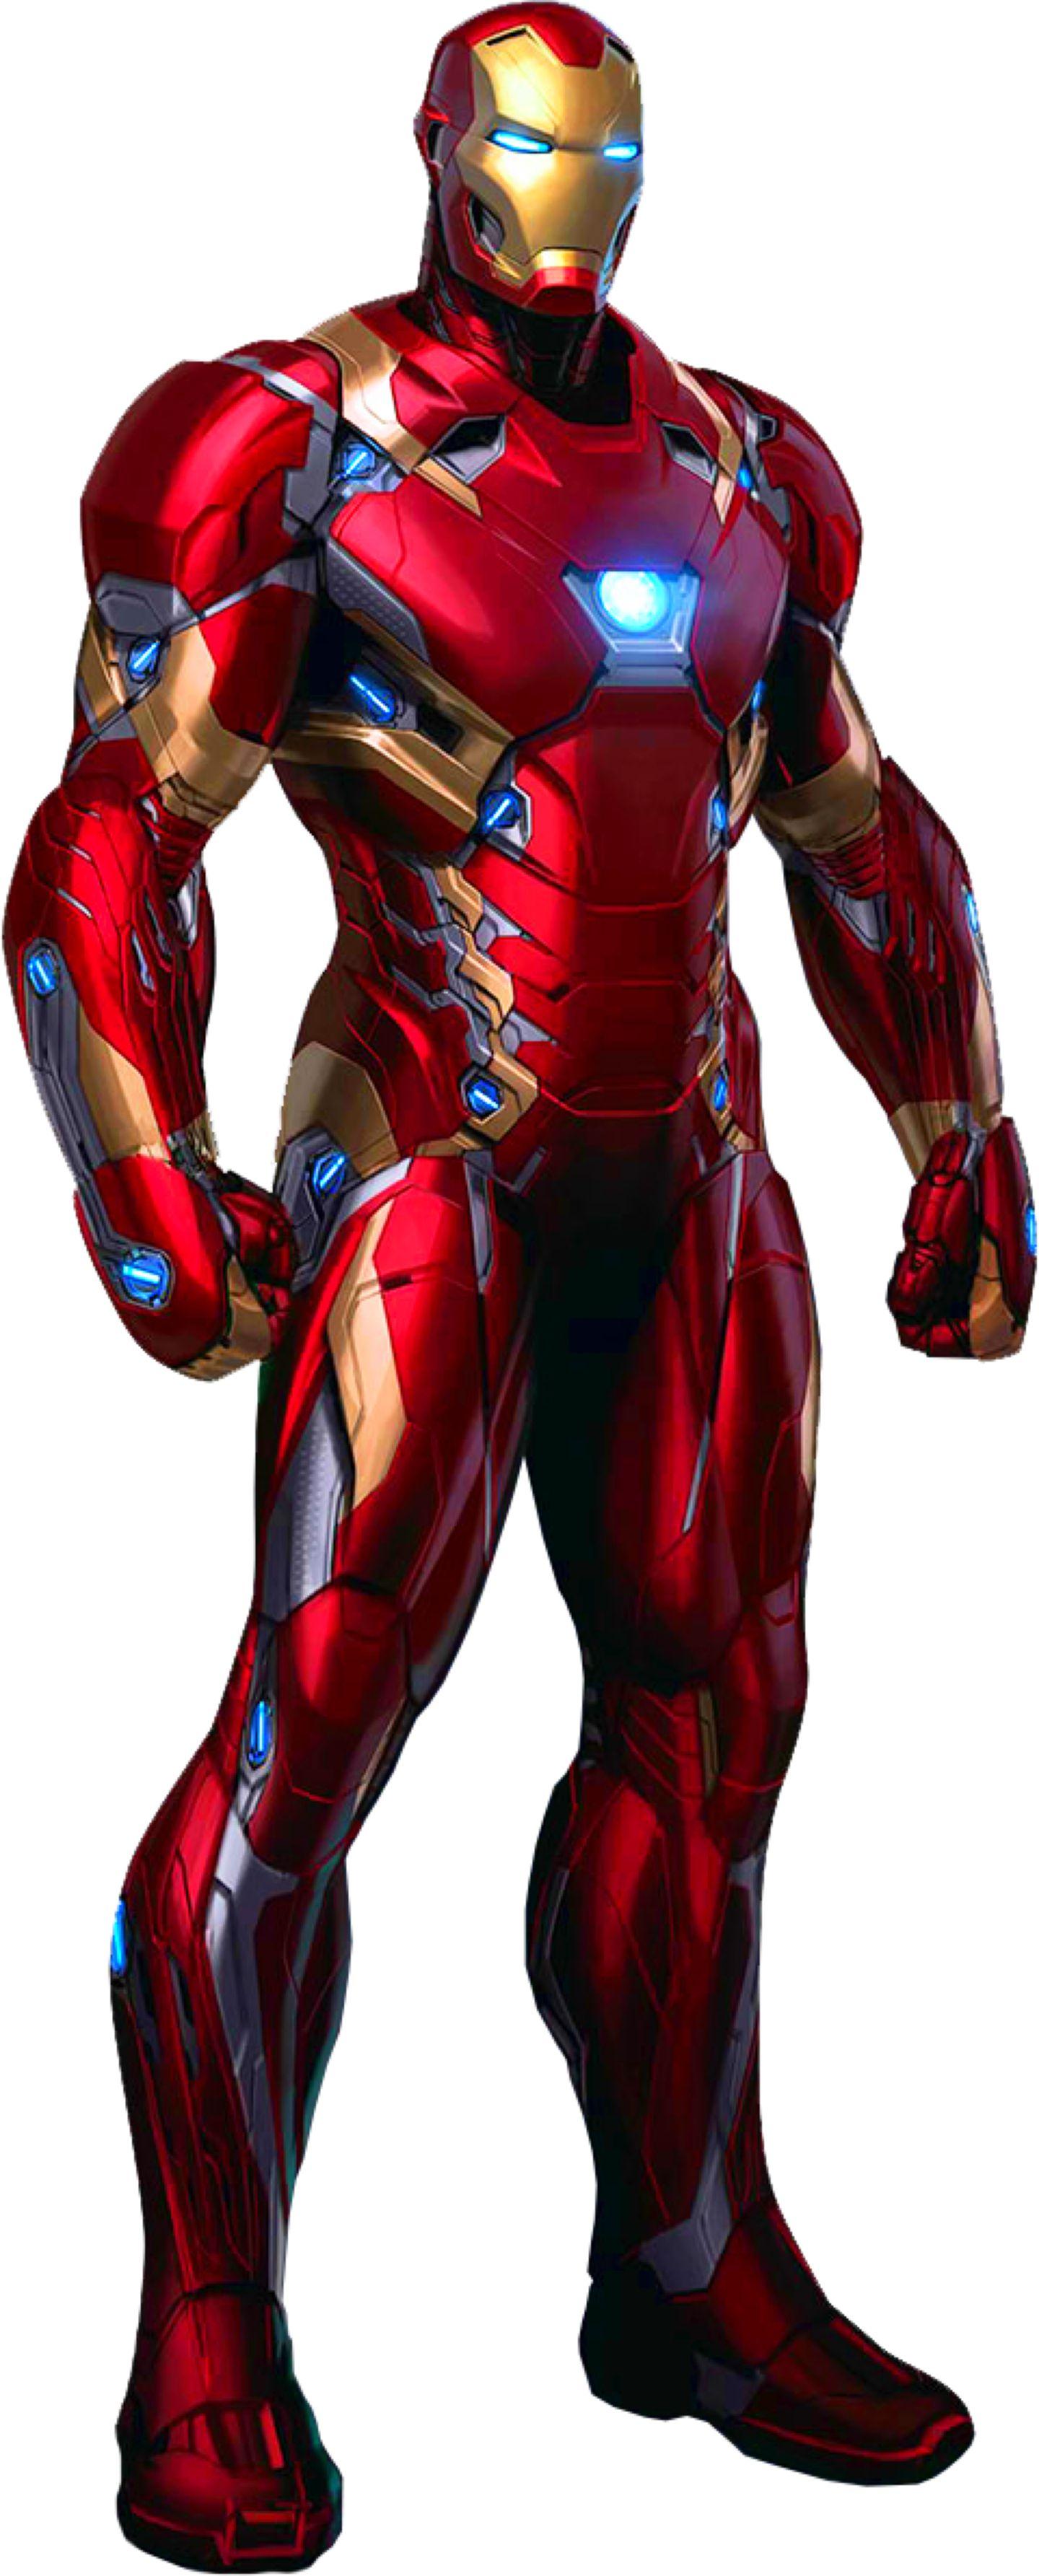 Iron Man MK XLVI